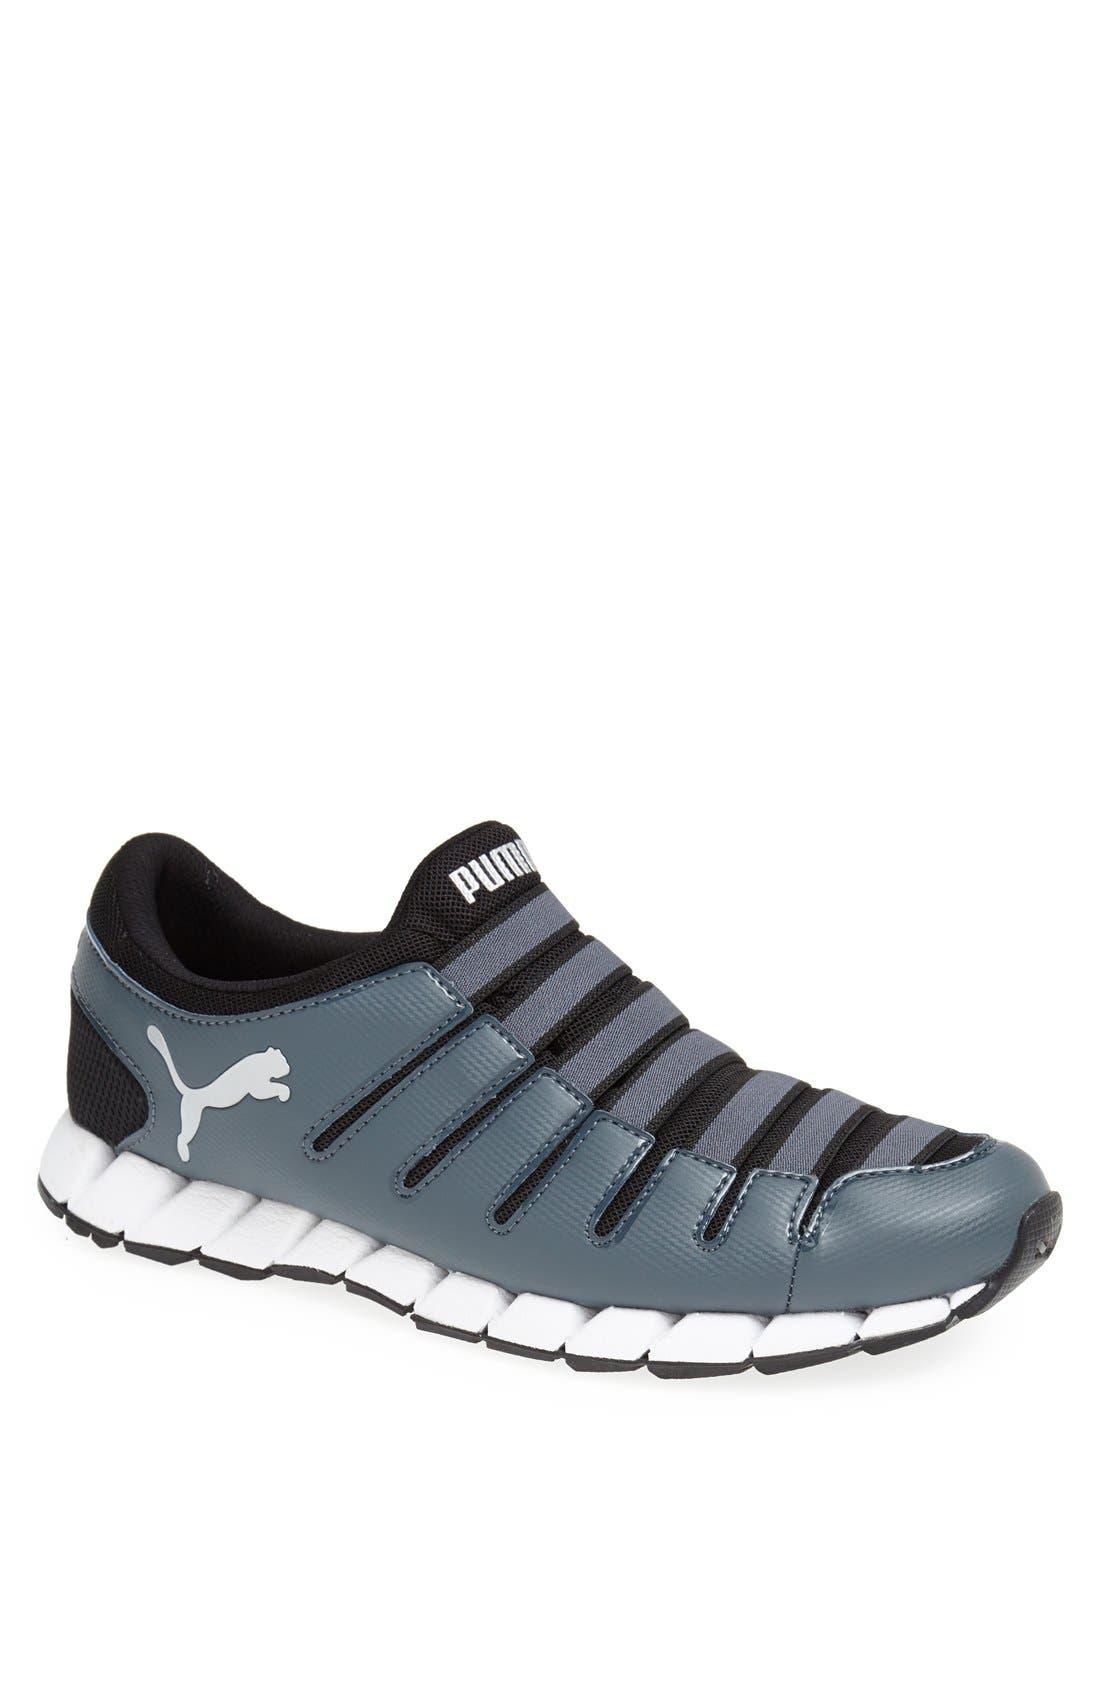 Main Image - PUMA 'Osu V3 NM' Running Shoe (Men)